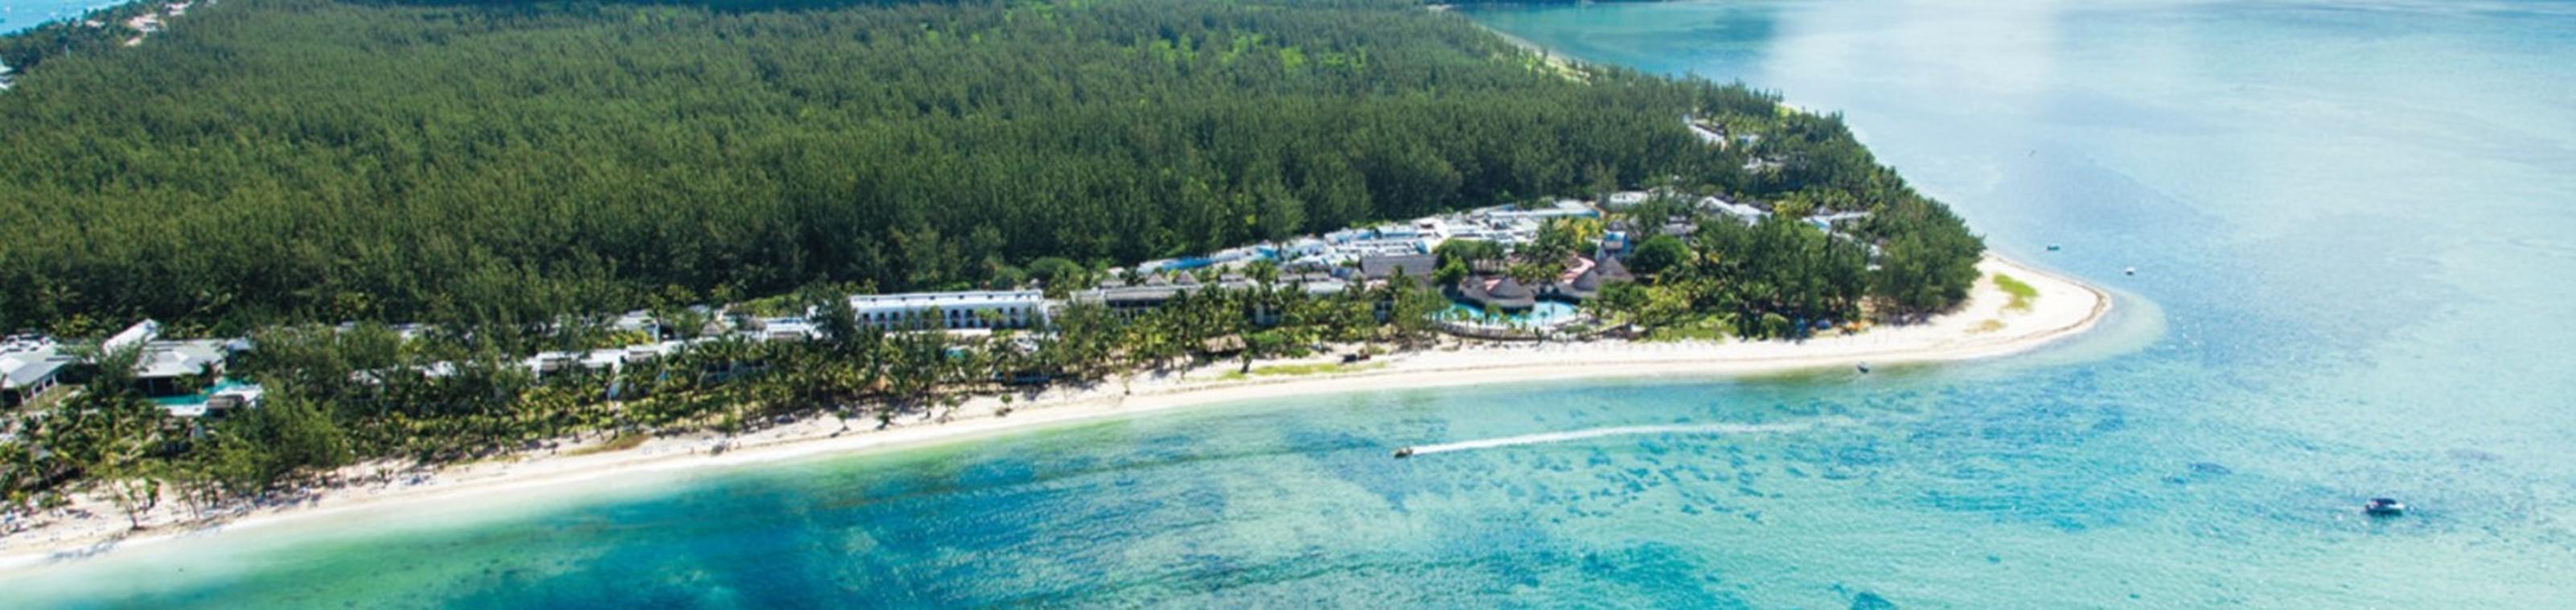 Viersterrenhotel Riu Creole op Mauritius